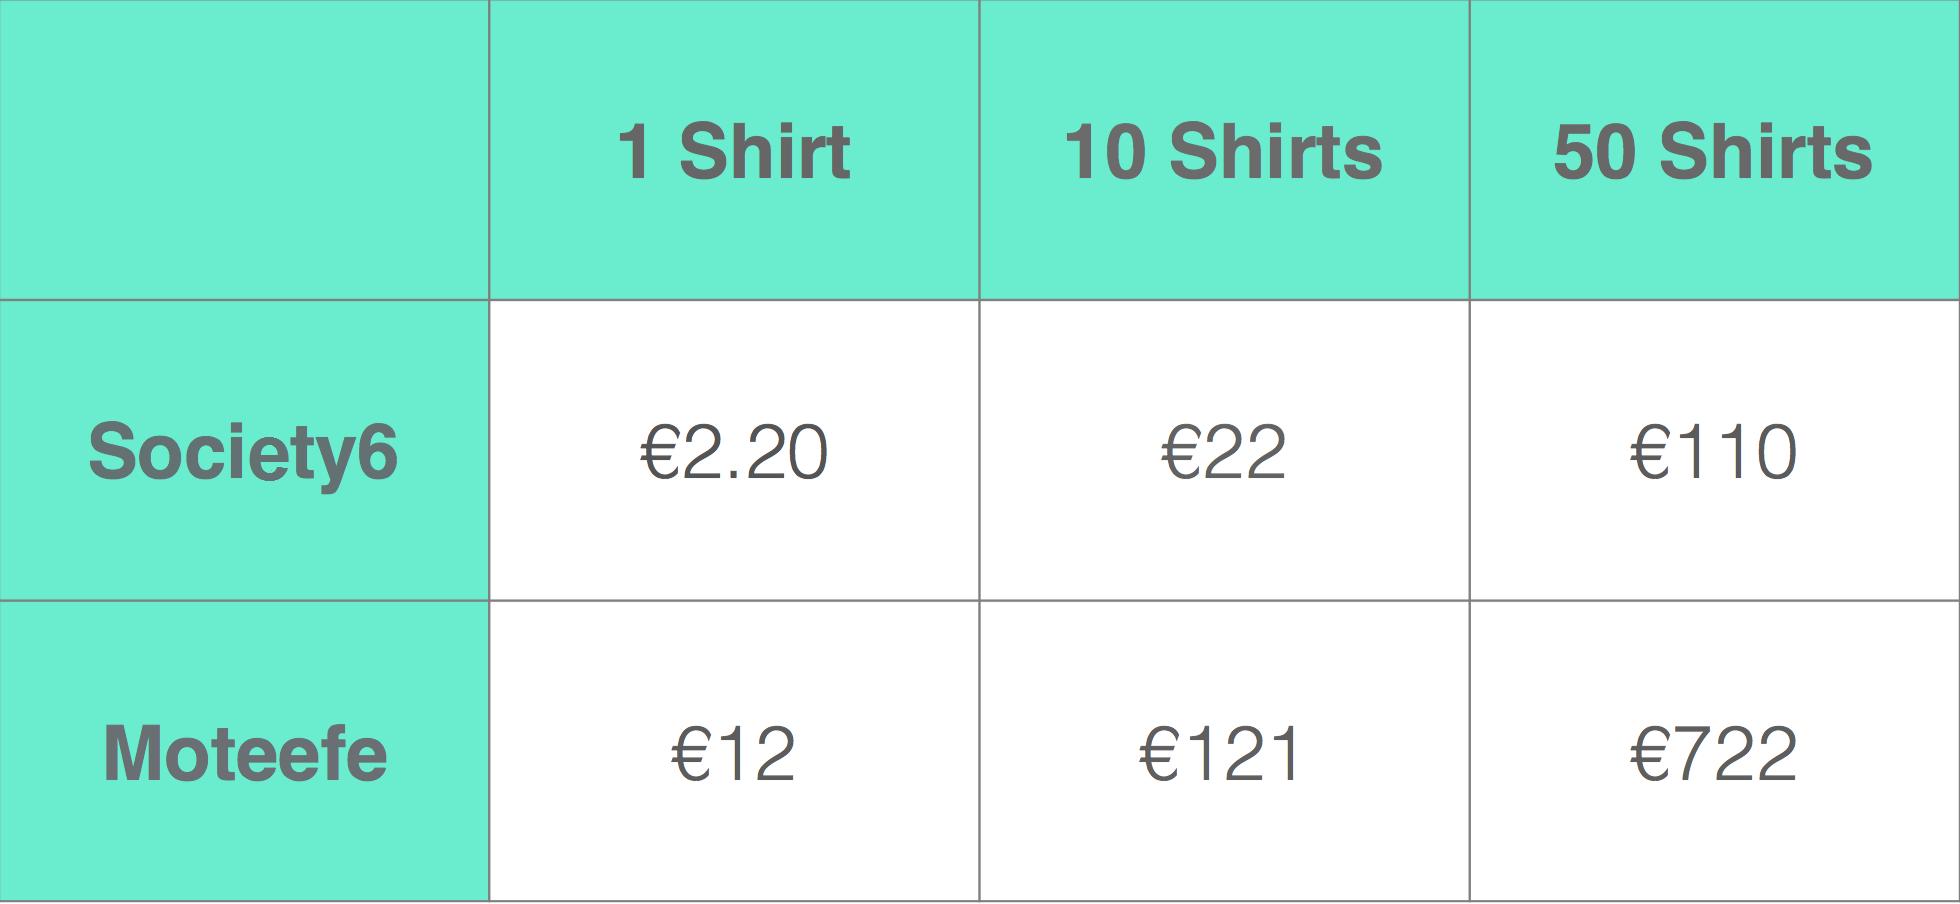 Moteefe vs Society6 pricing